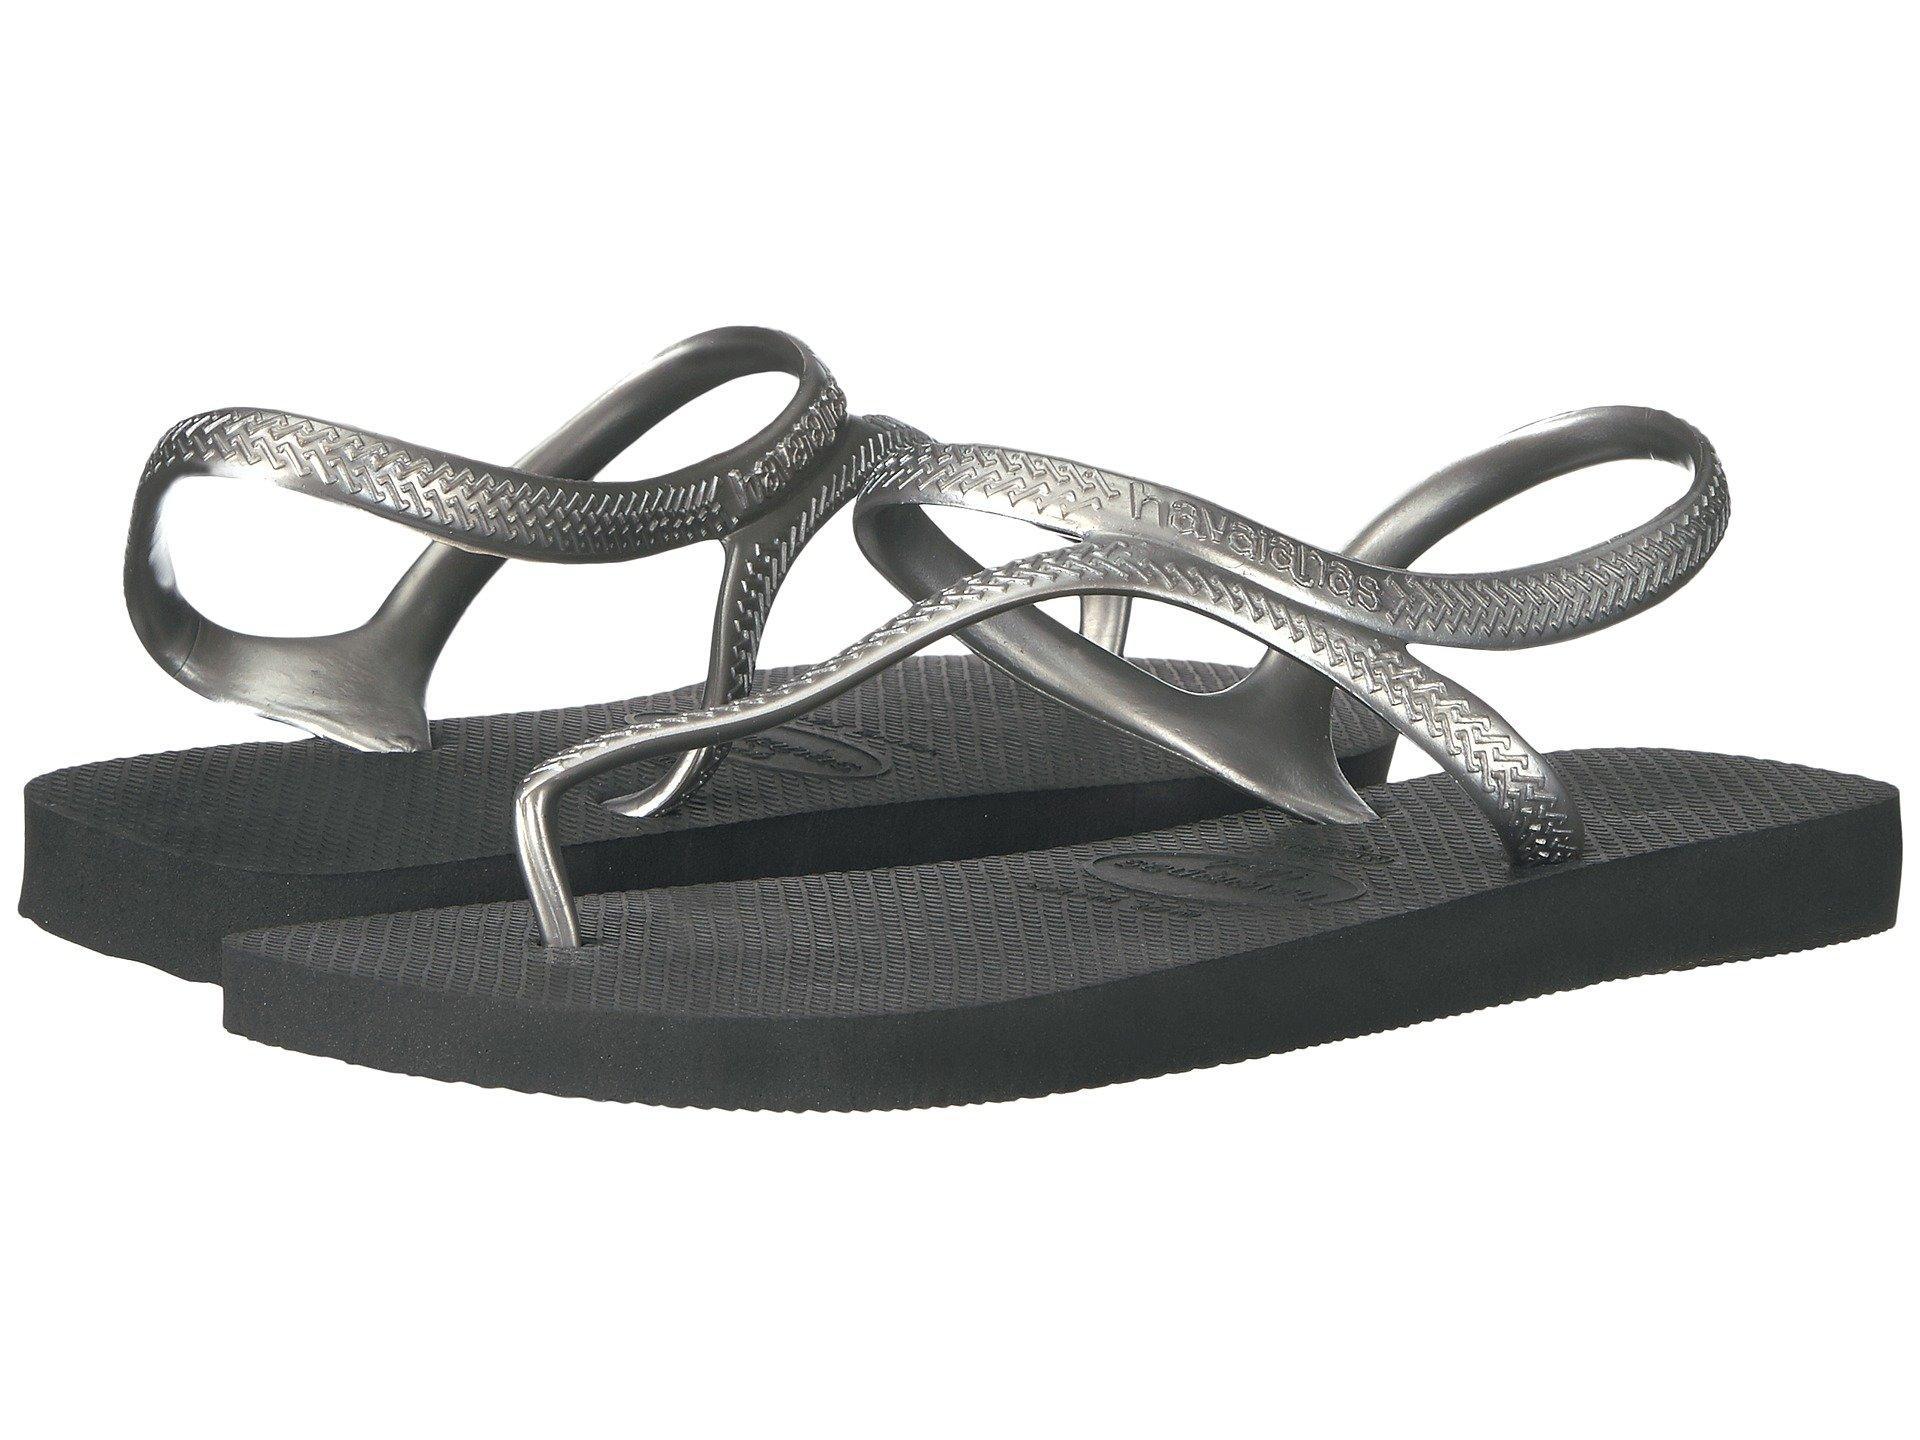 42ea0d0e3f7d6 Lyst - Havaianas Flash Urban Flip Flops (rose Gold) Women s Shoes in ...